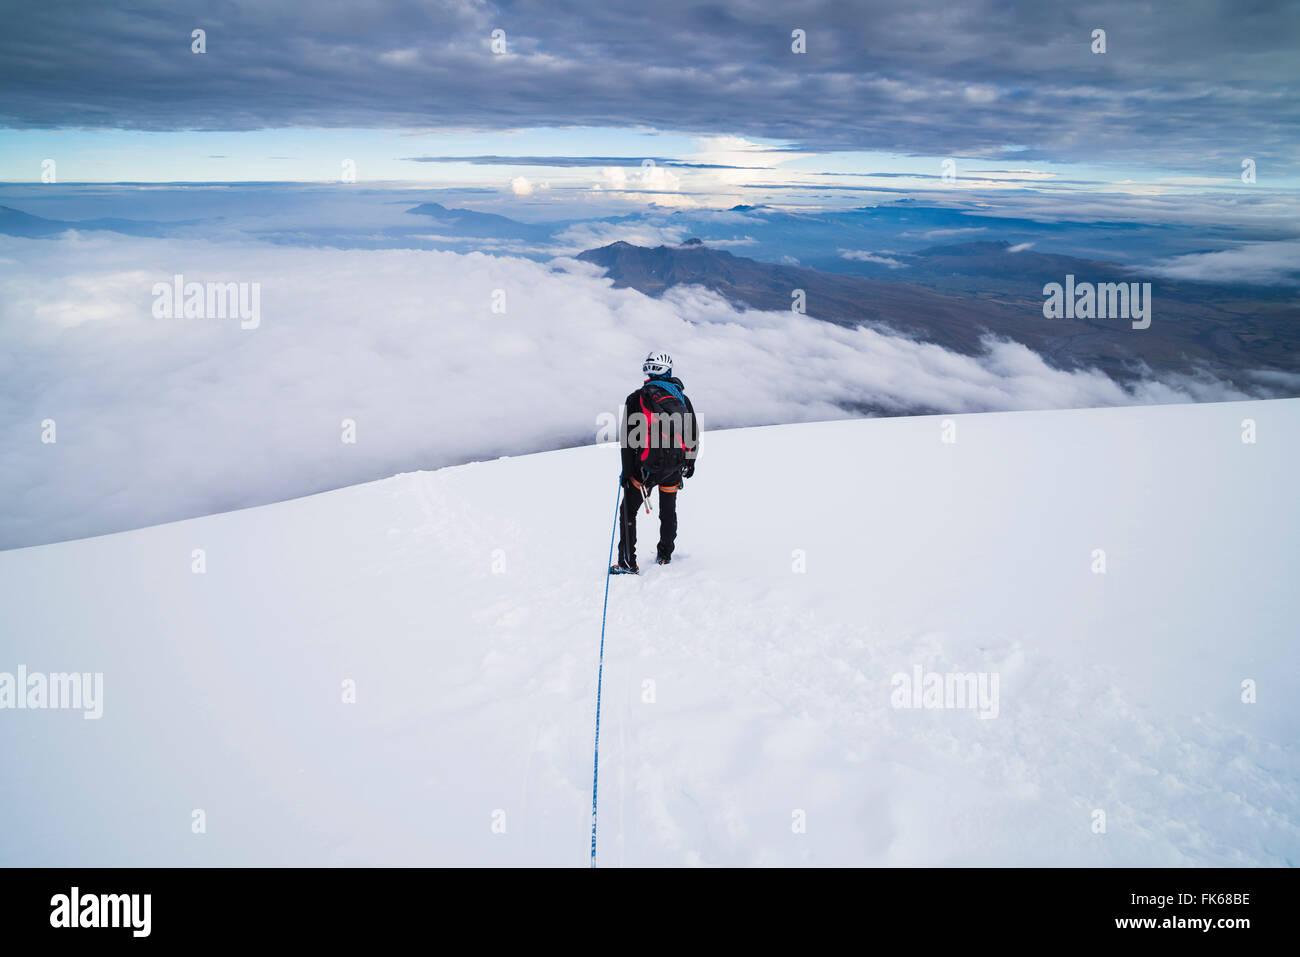 Kletterer am oberen Rand Vulkan Cotopaxi, Provinz Cotopaxi in Ecuador, Südamerika Stockbild